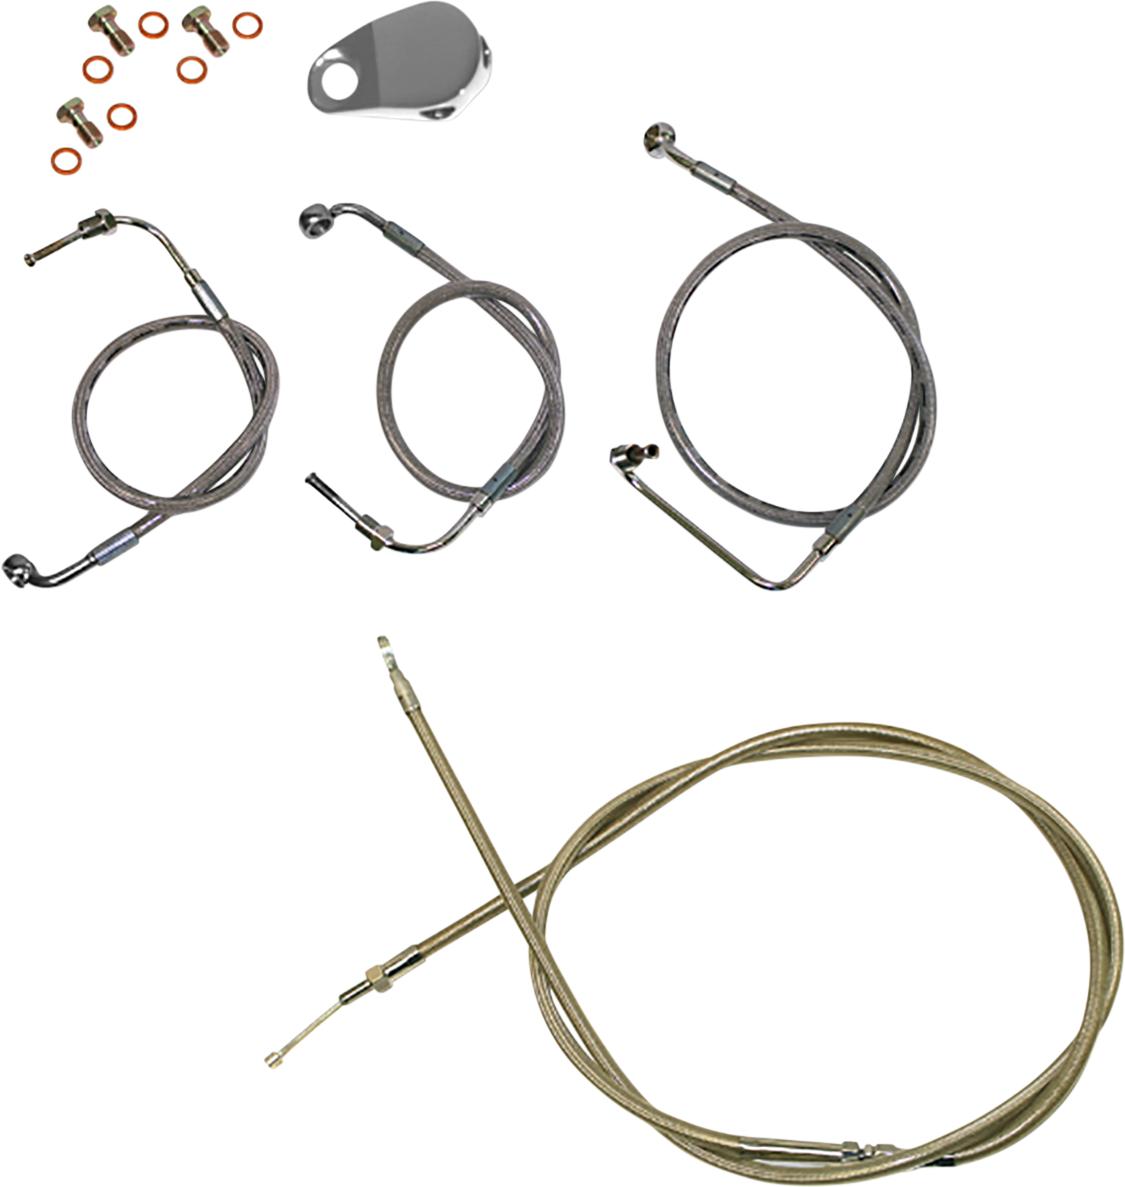 "La Choppers 12""-14"" Ape Hanger Handlebar Cable Kit 2018-2021 Harley Softail FXFB"